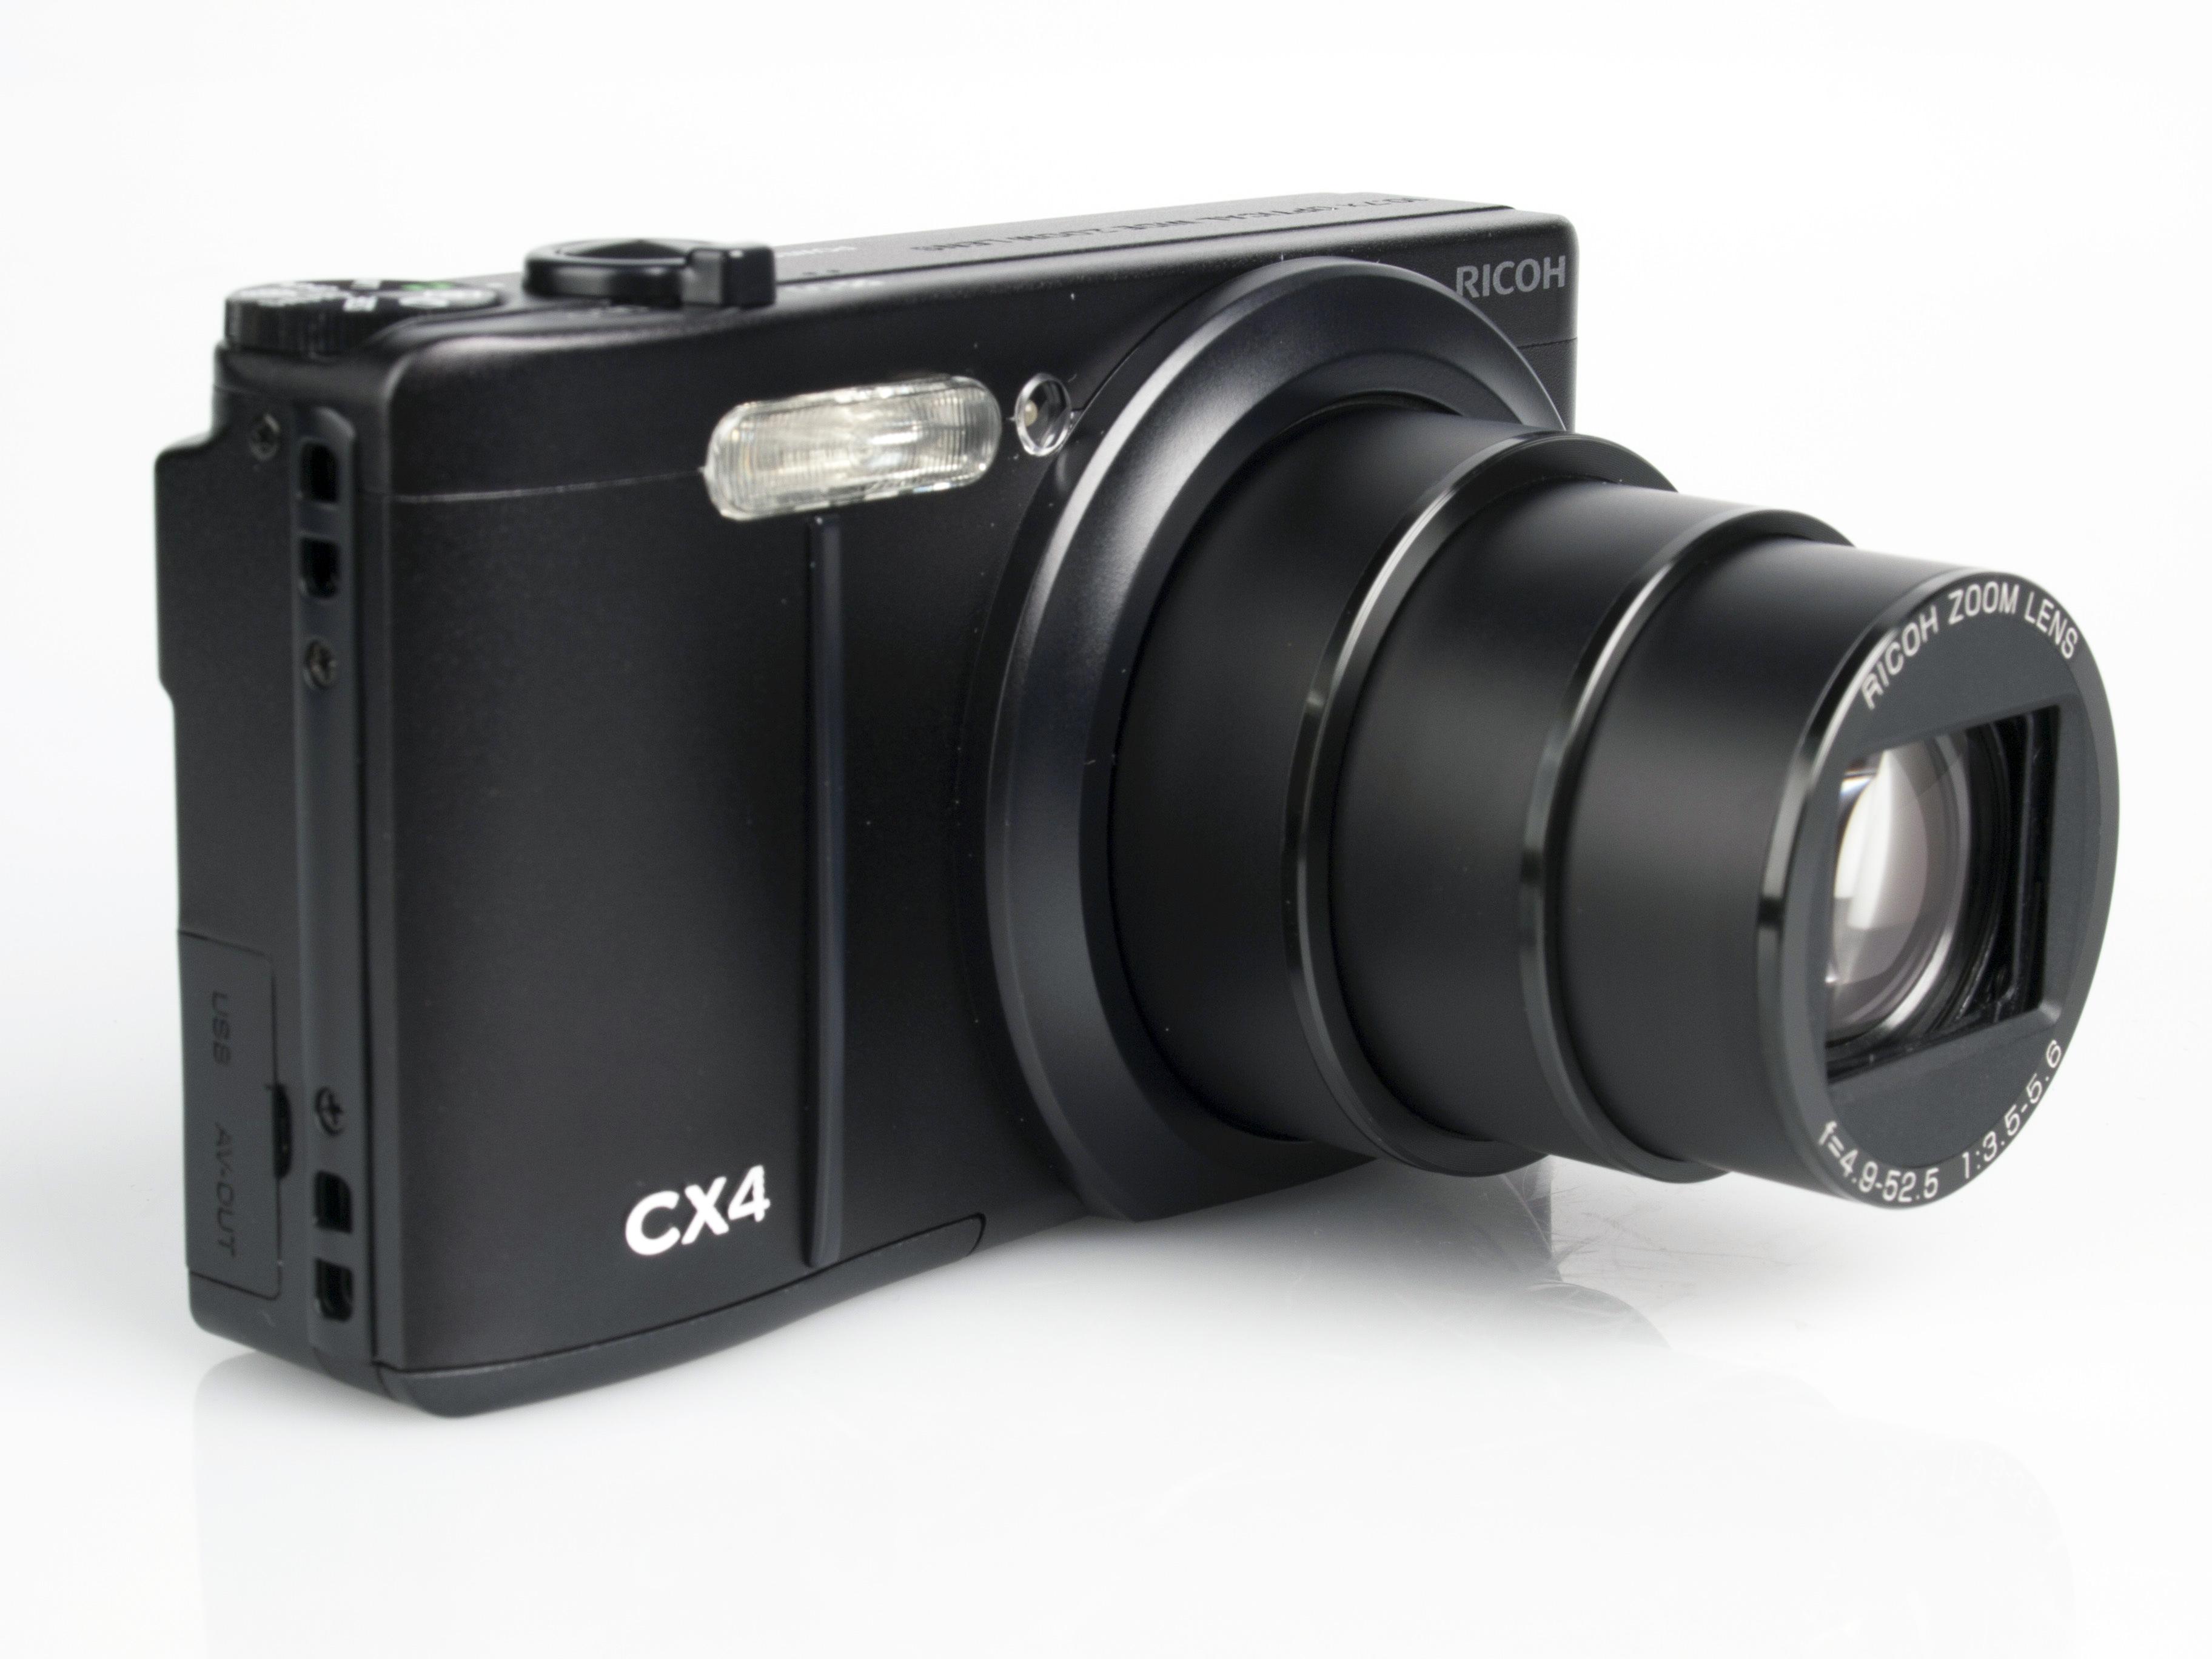 Ricoh CX4 Digital Camera Windows 8 Drivers Download (2019)